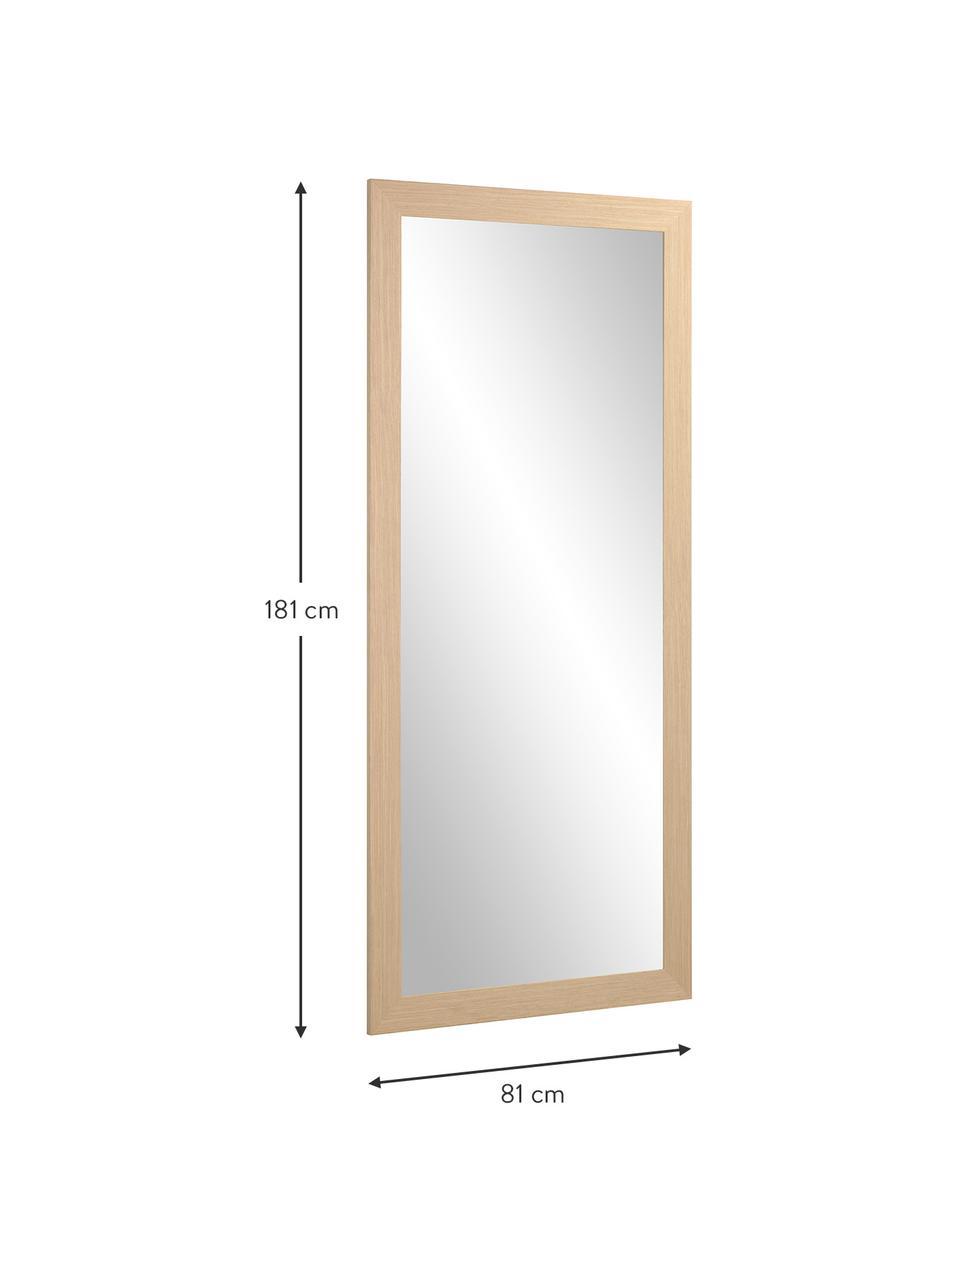 Leunende spiegel Yvaine met houten lijst, Lijst: hout, Beige, 81 x 181 cm